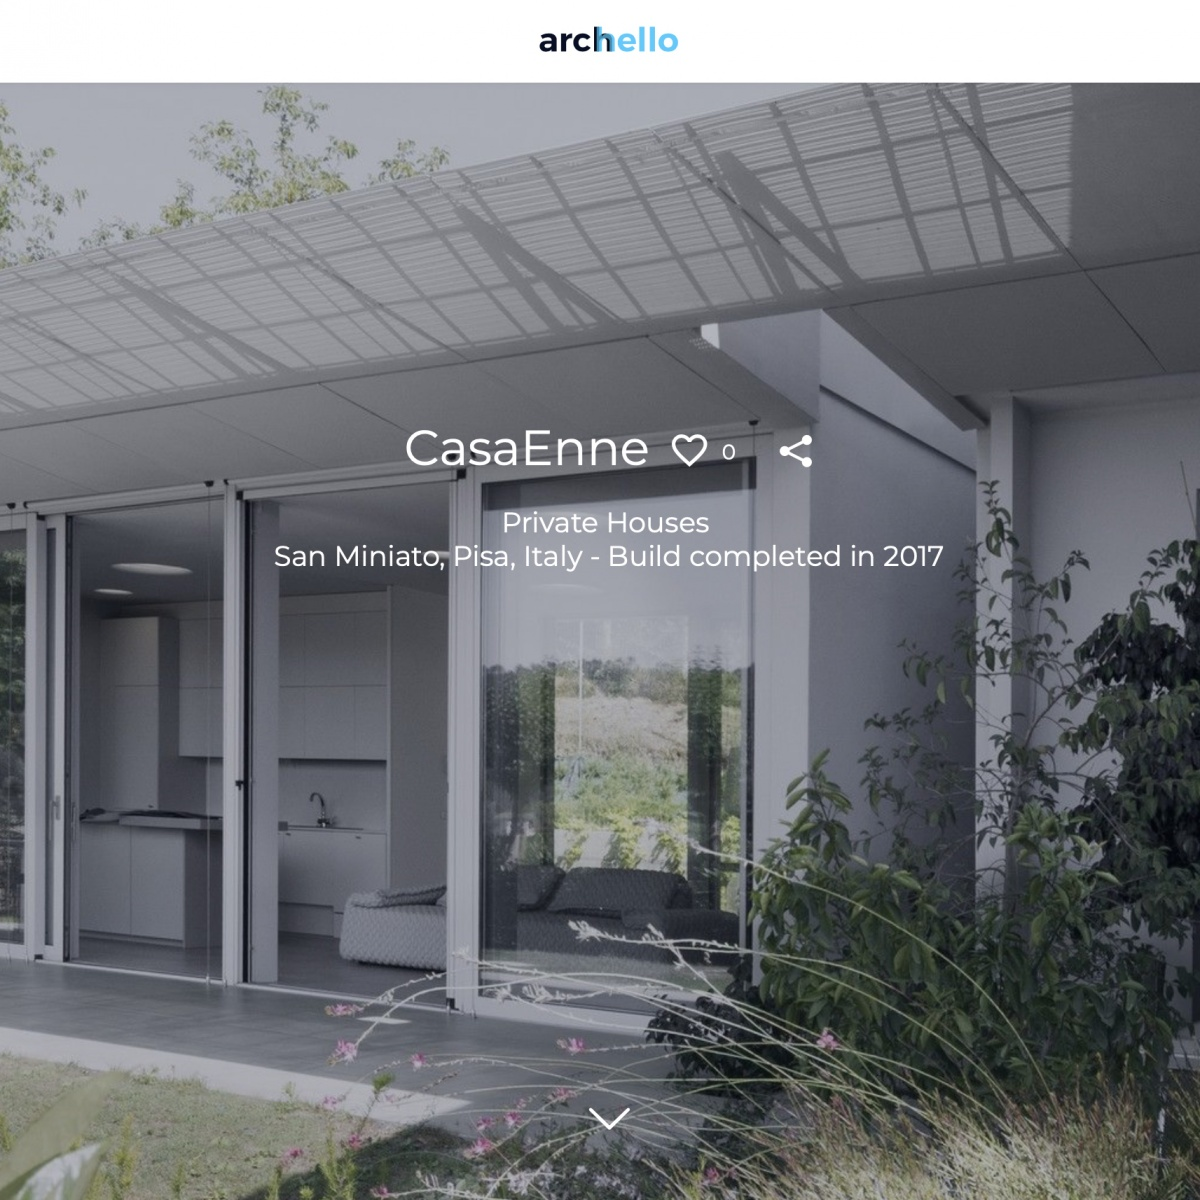 archello pubblica casa enne residenza casa contemporanea in toscana a san miniato pisa